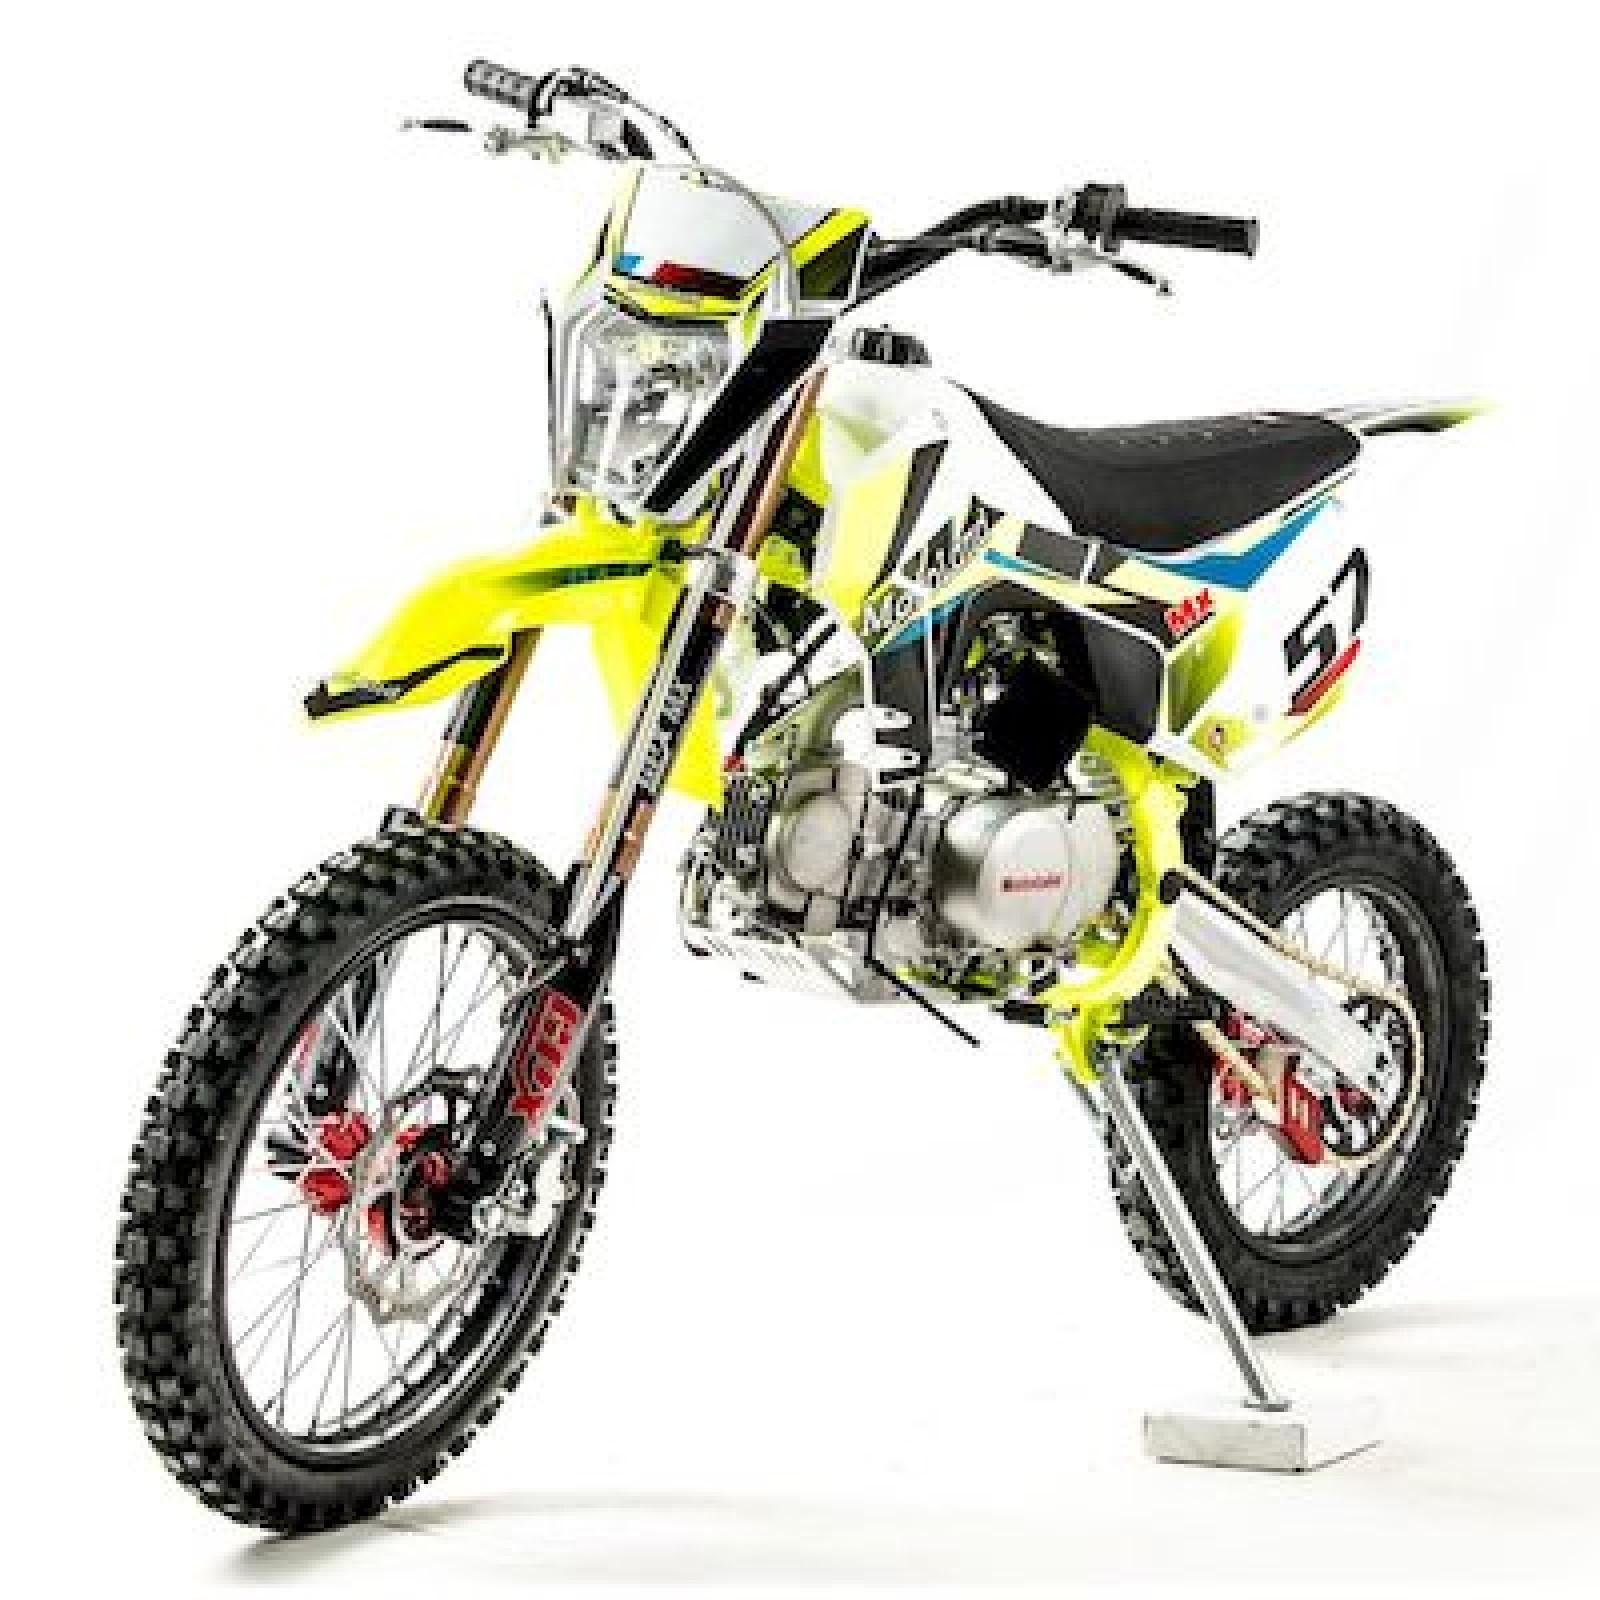 Питбайк MotoLand MX125 KKE (2021)